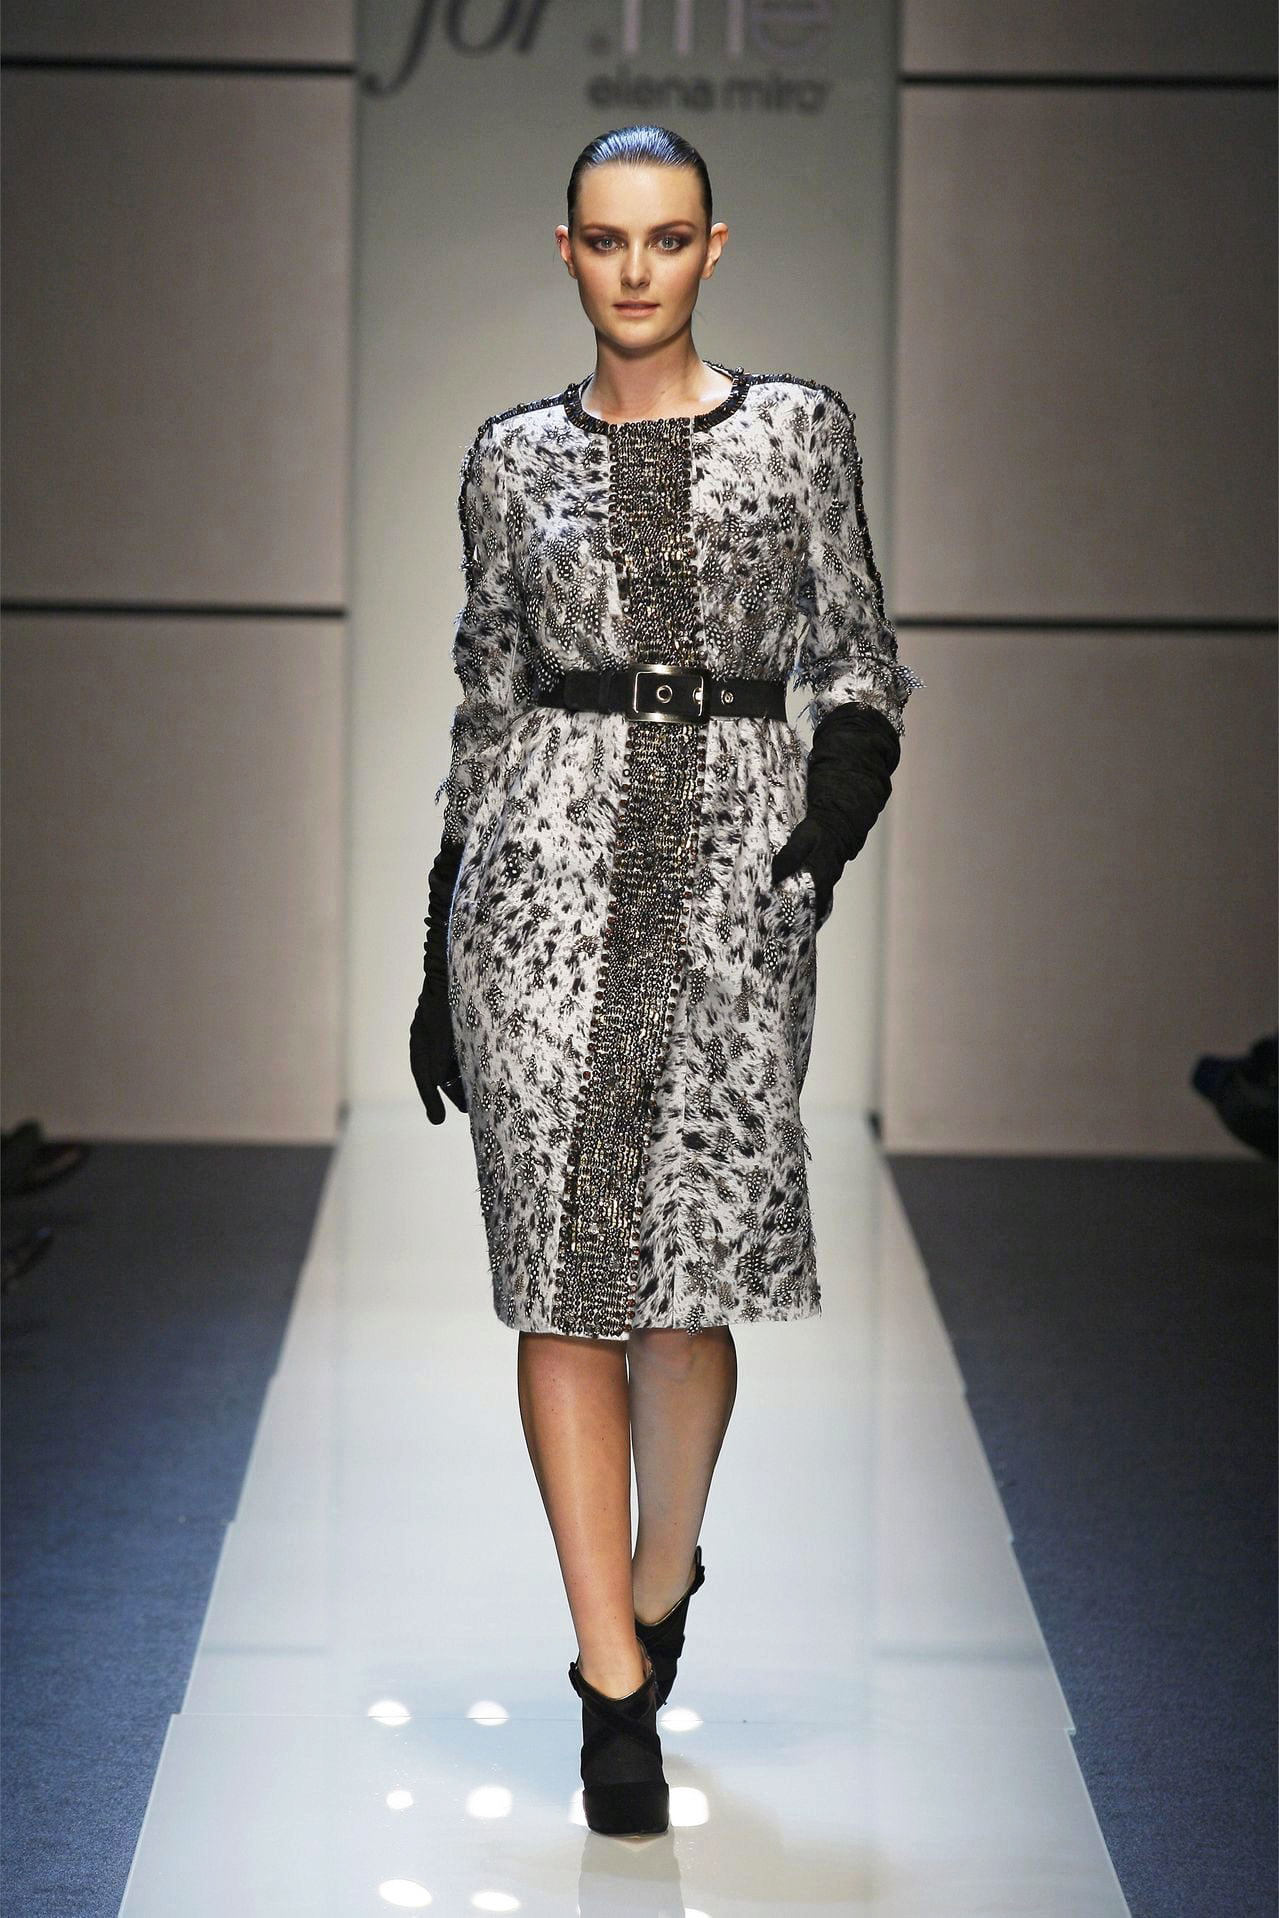 dresses for big woman